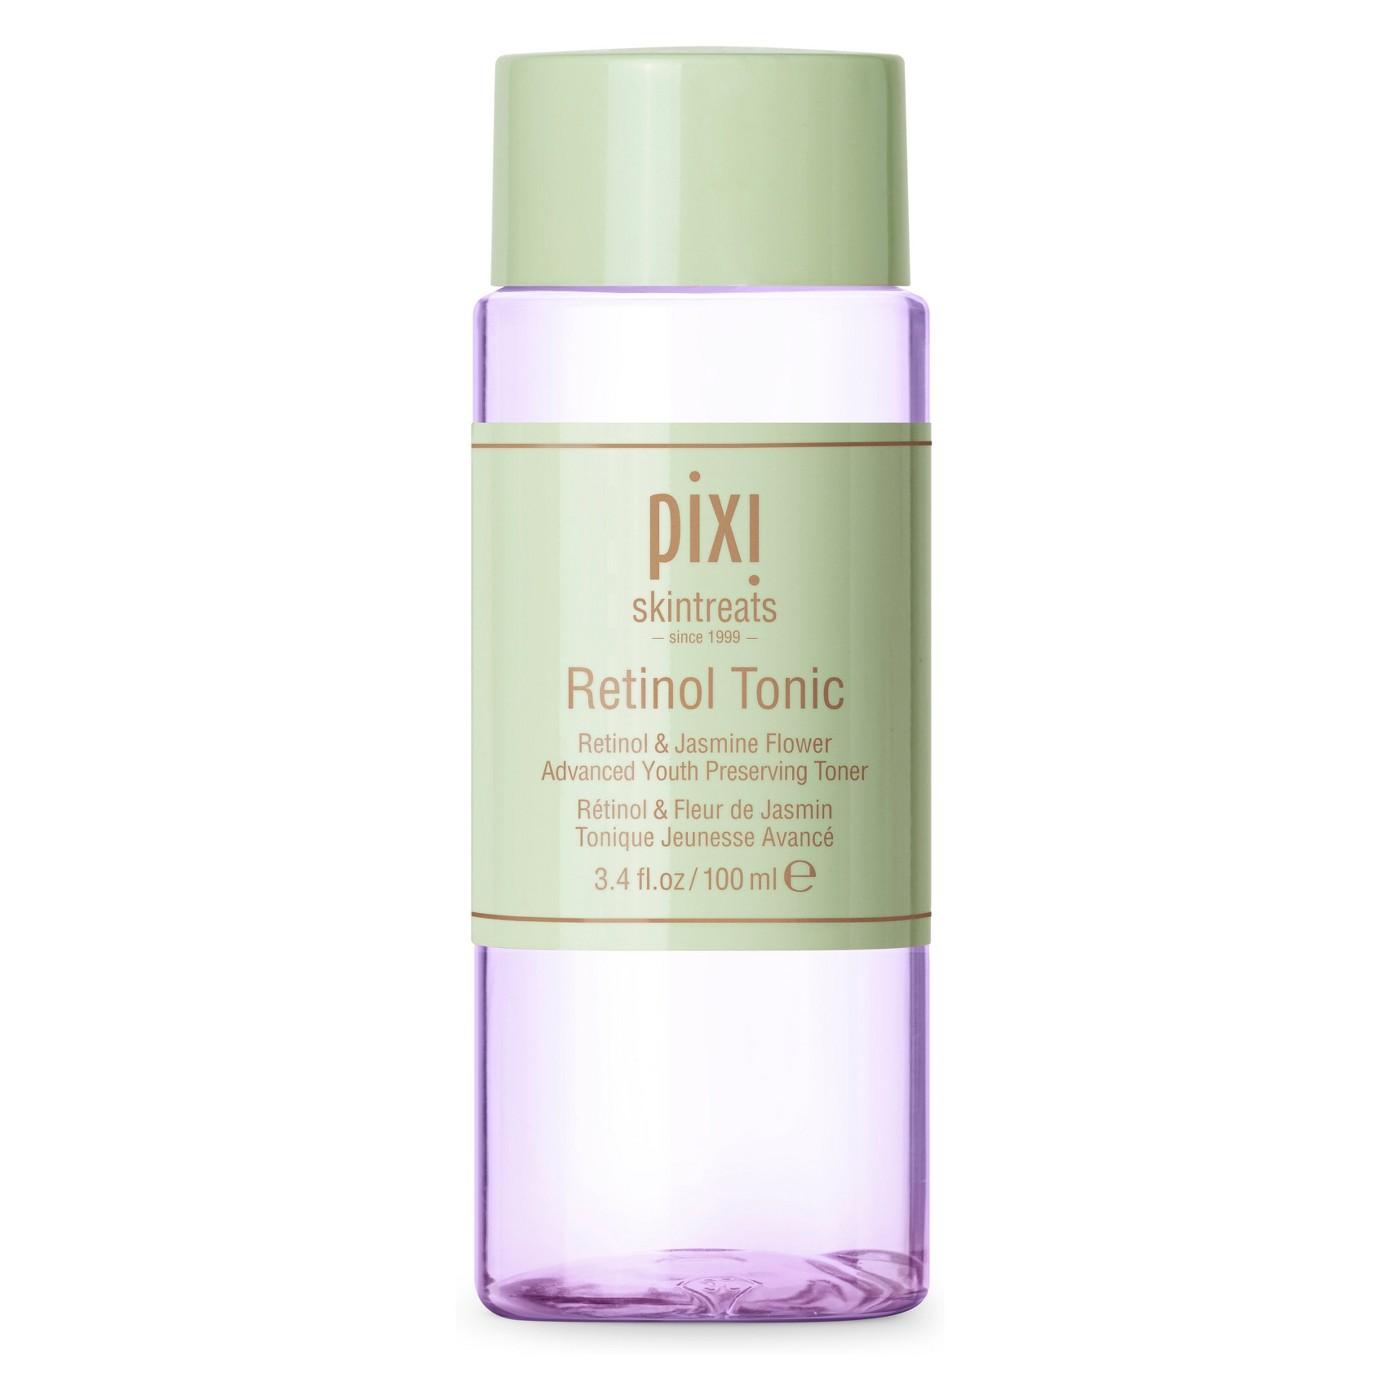 Pixi-skin-treats-retinol-tonic